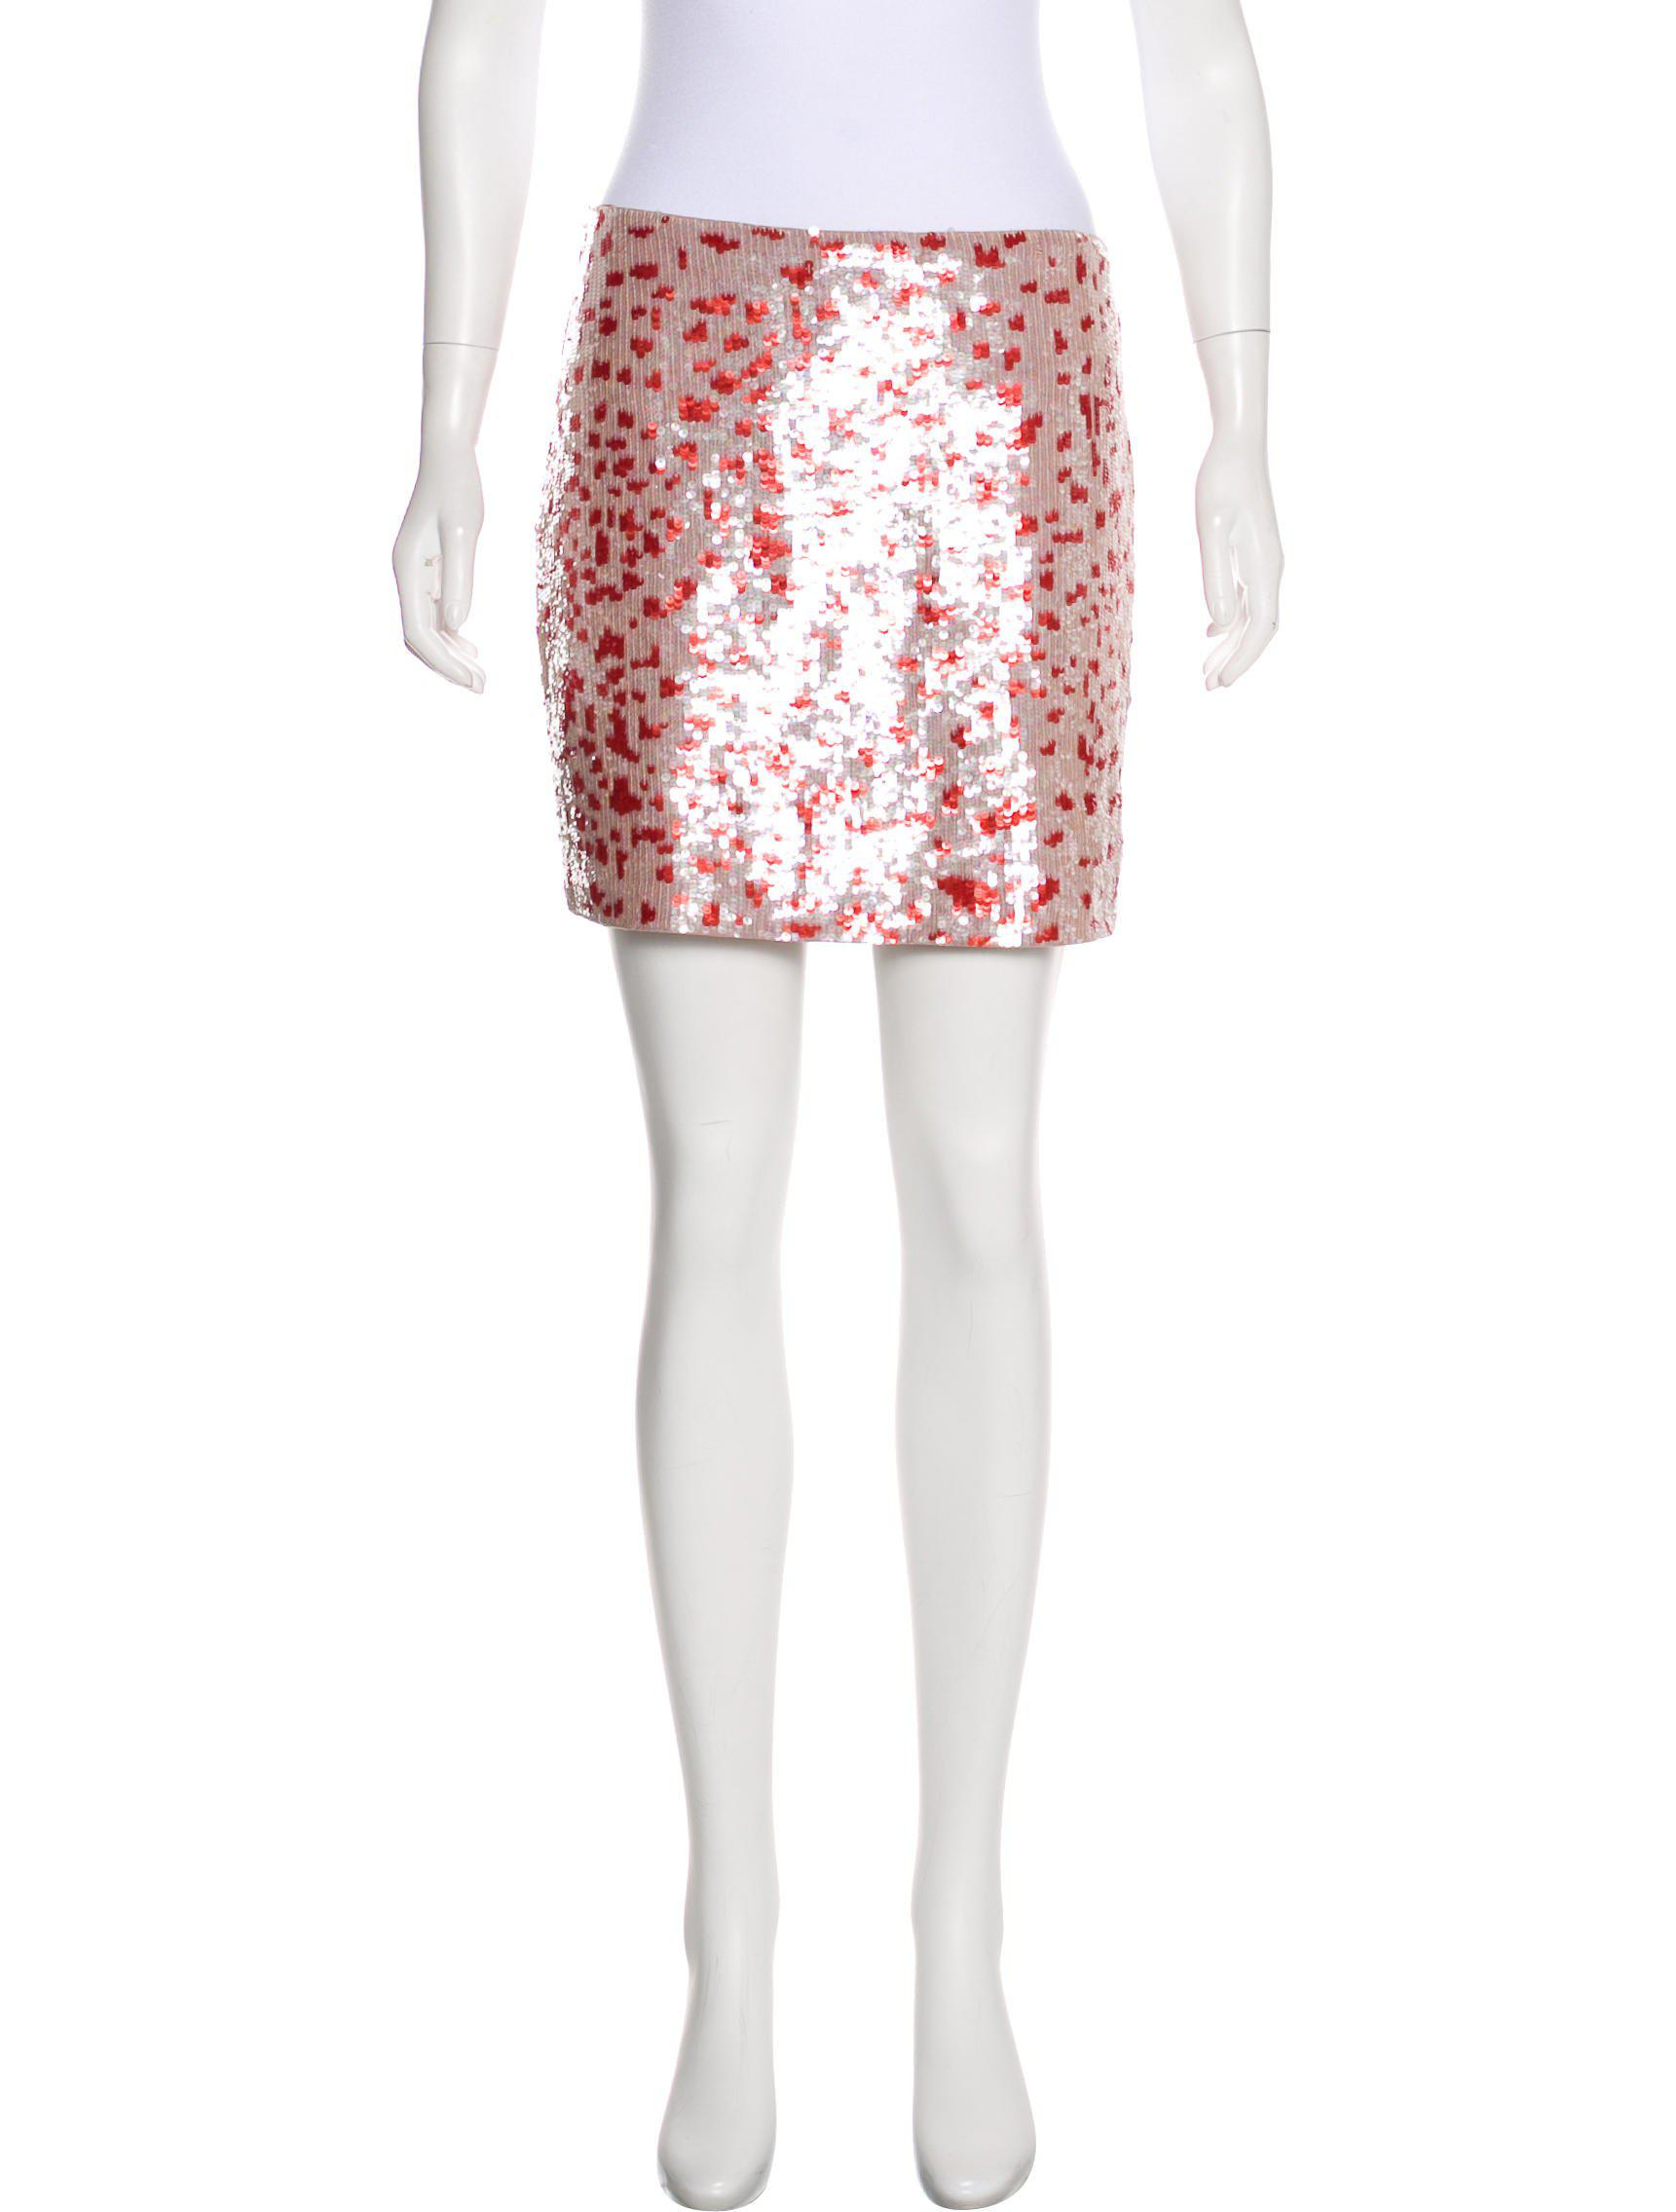 3463a148b5 Lyst - Sachin & Babi Sequin Mini Skirt in Red